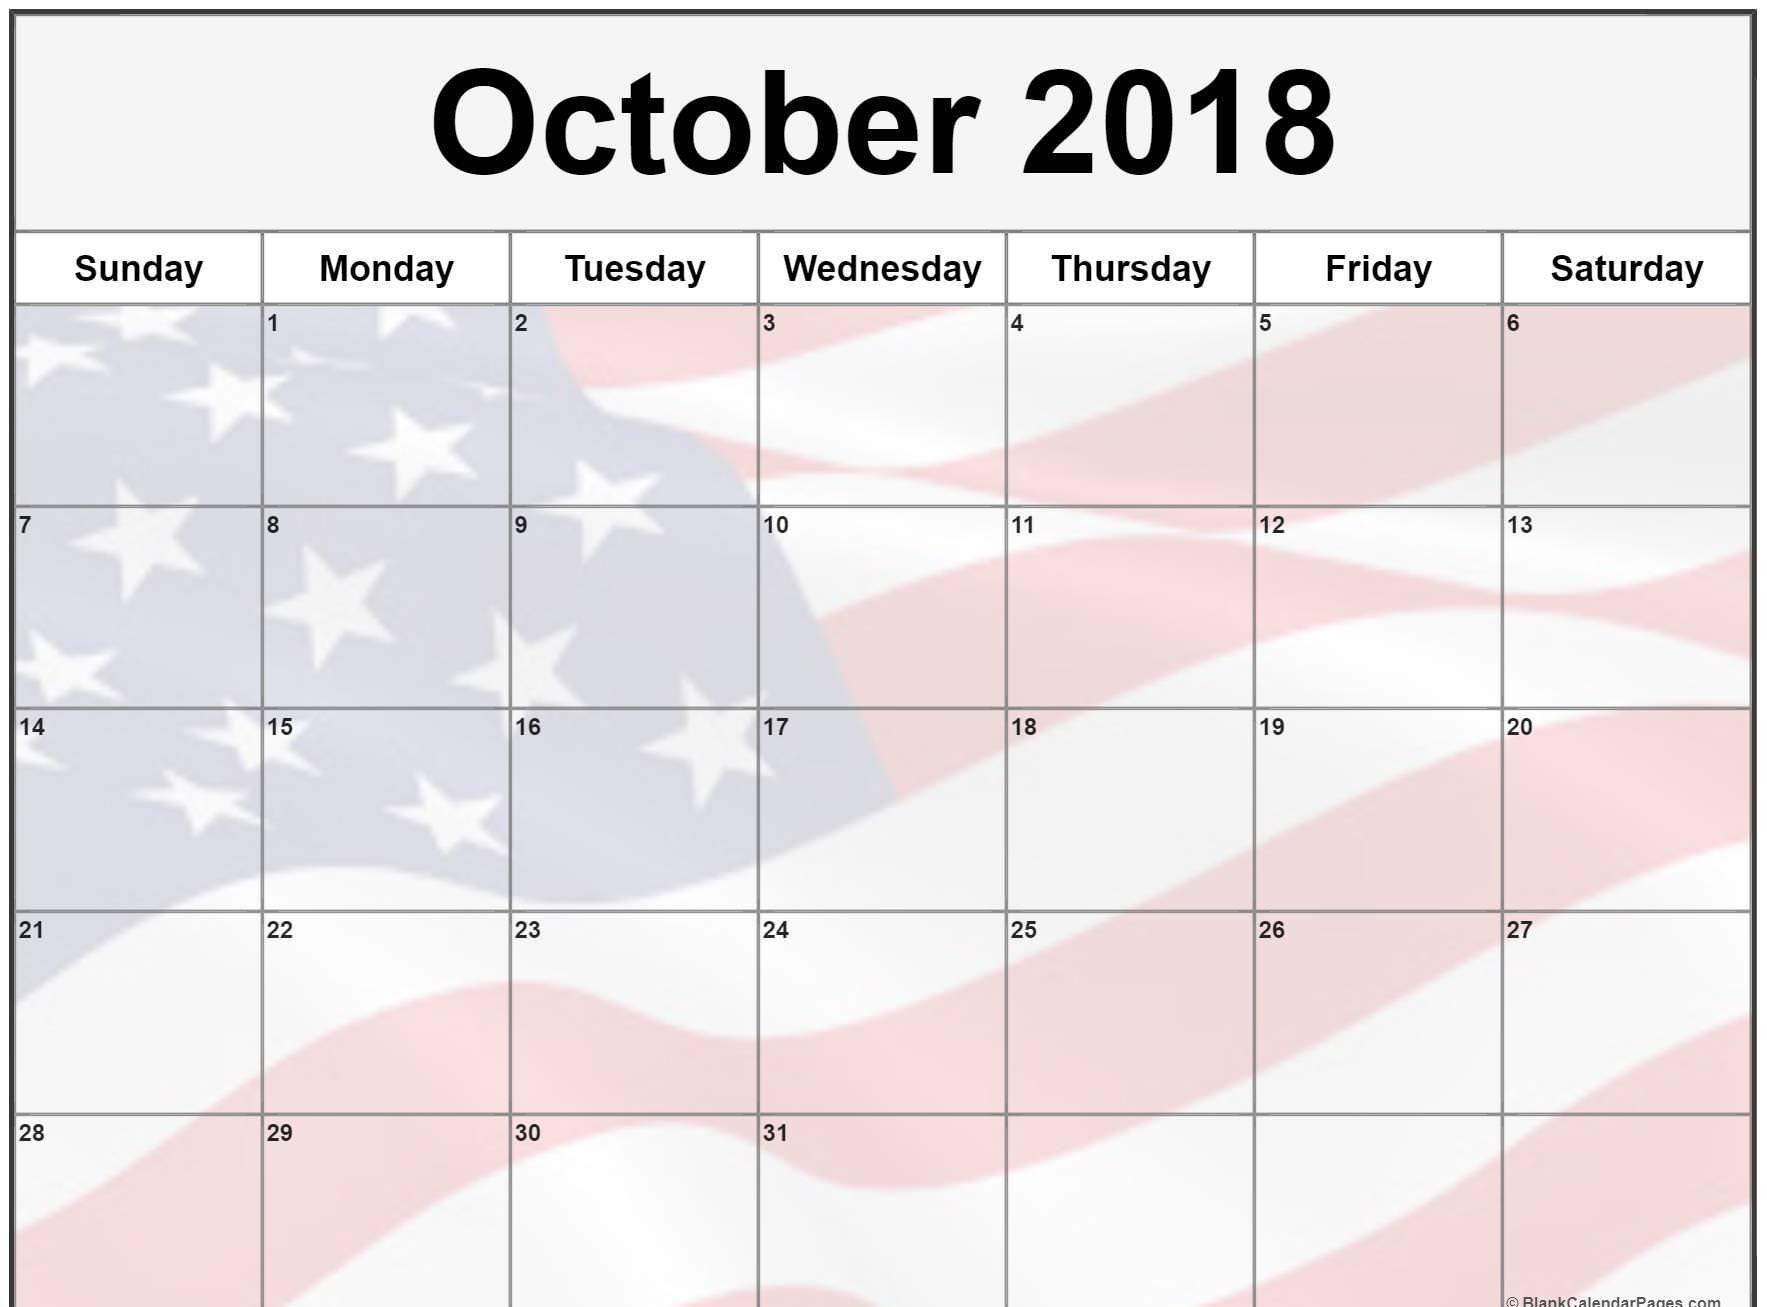 October 2018 Calendar with Holidays Printable